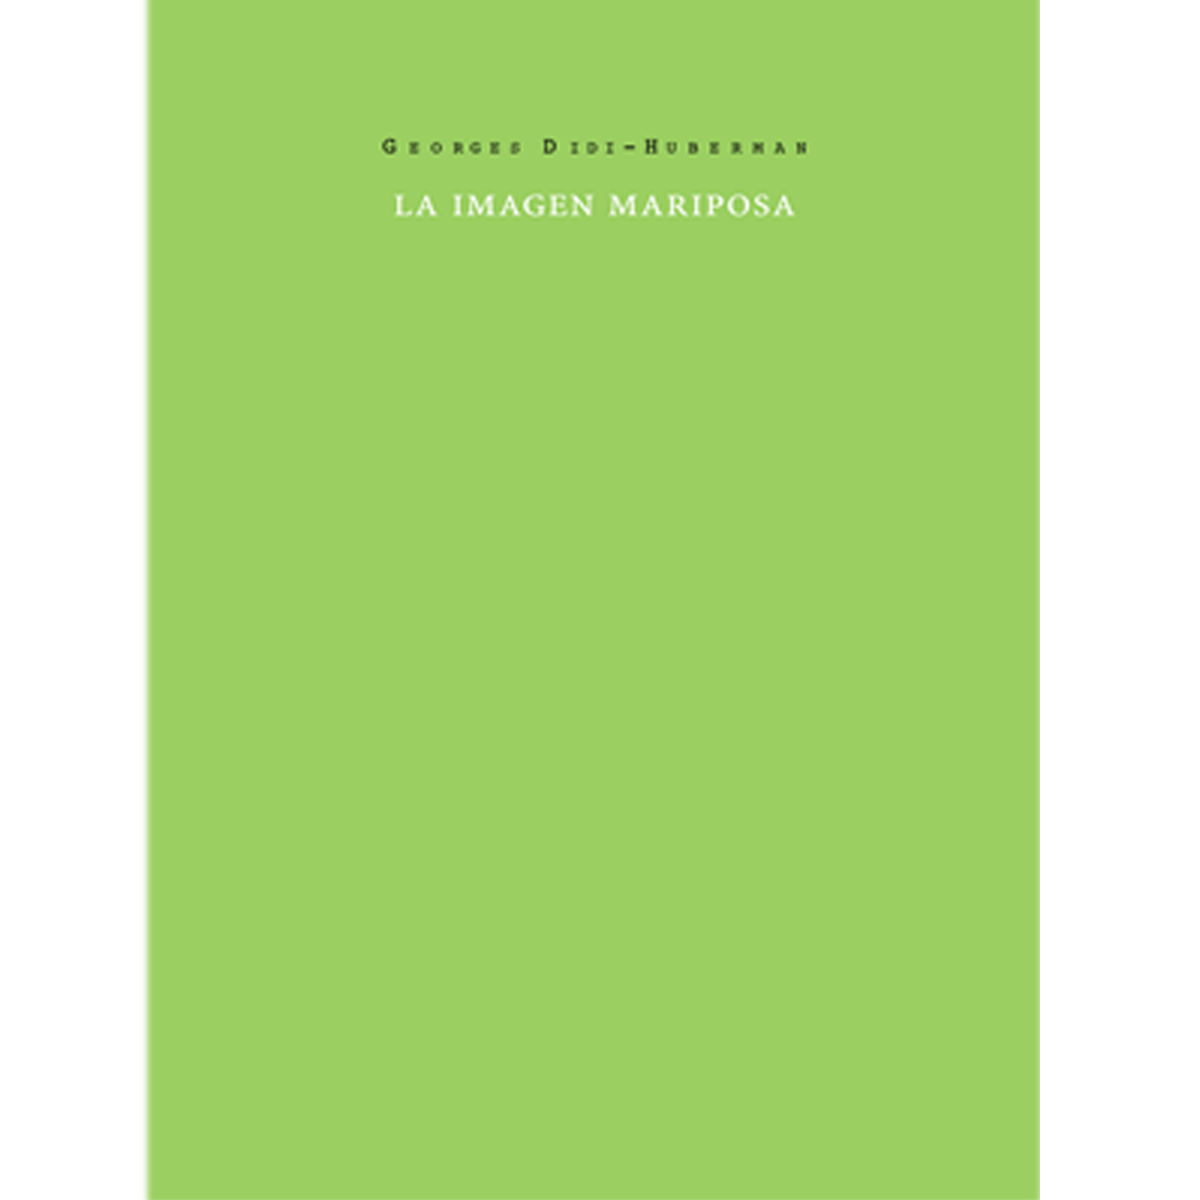 La Imagen Mariposa